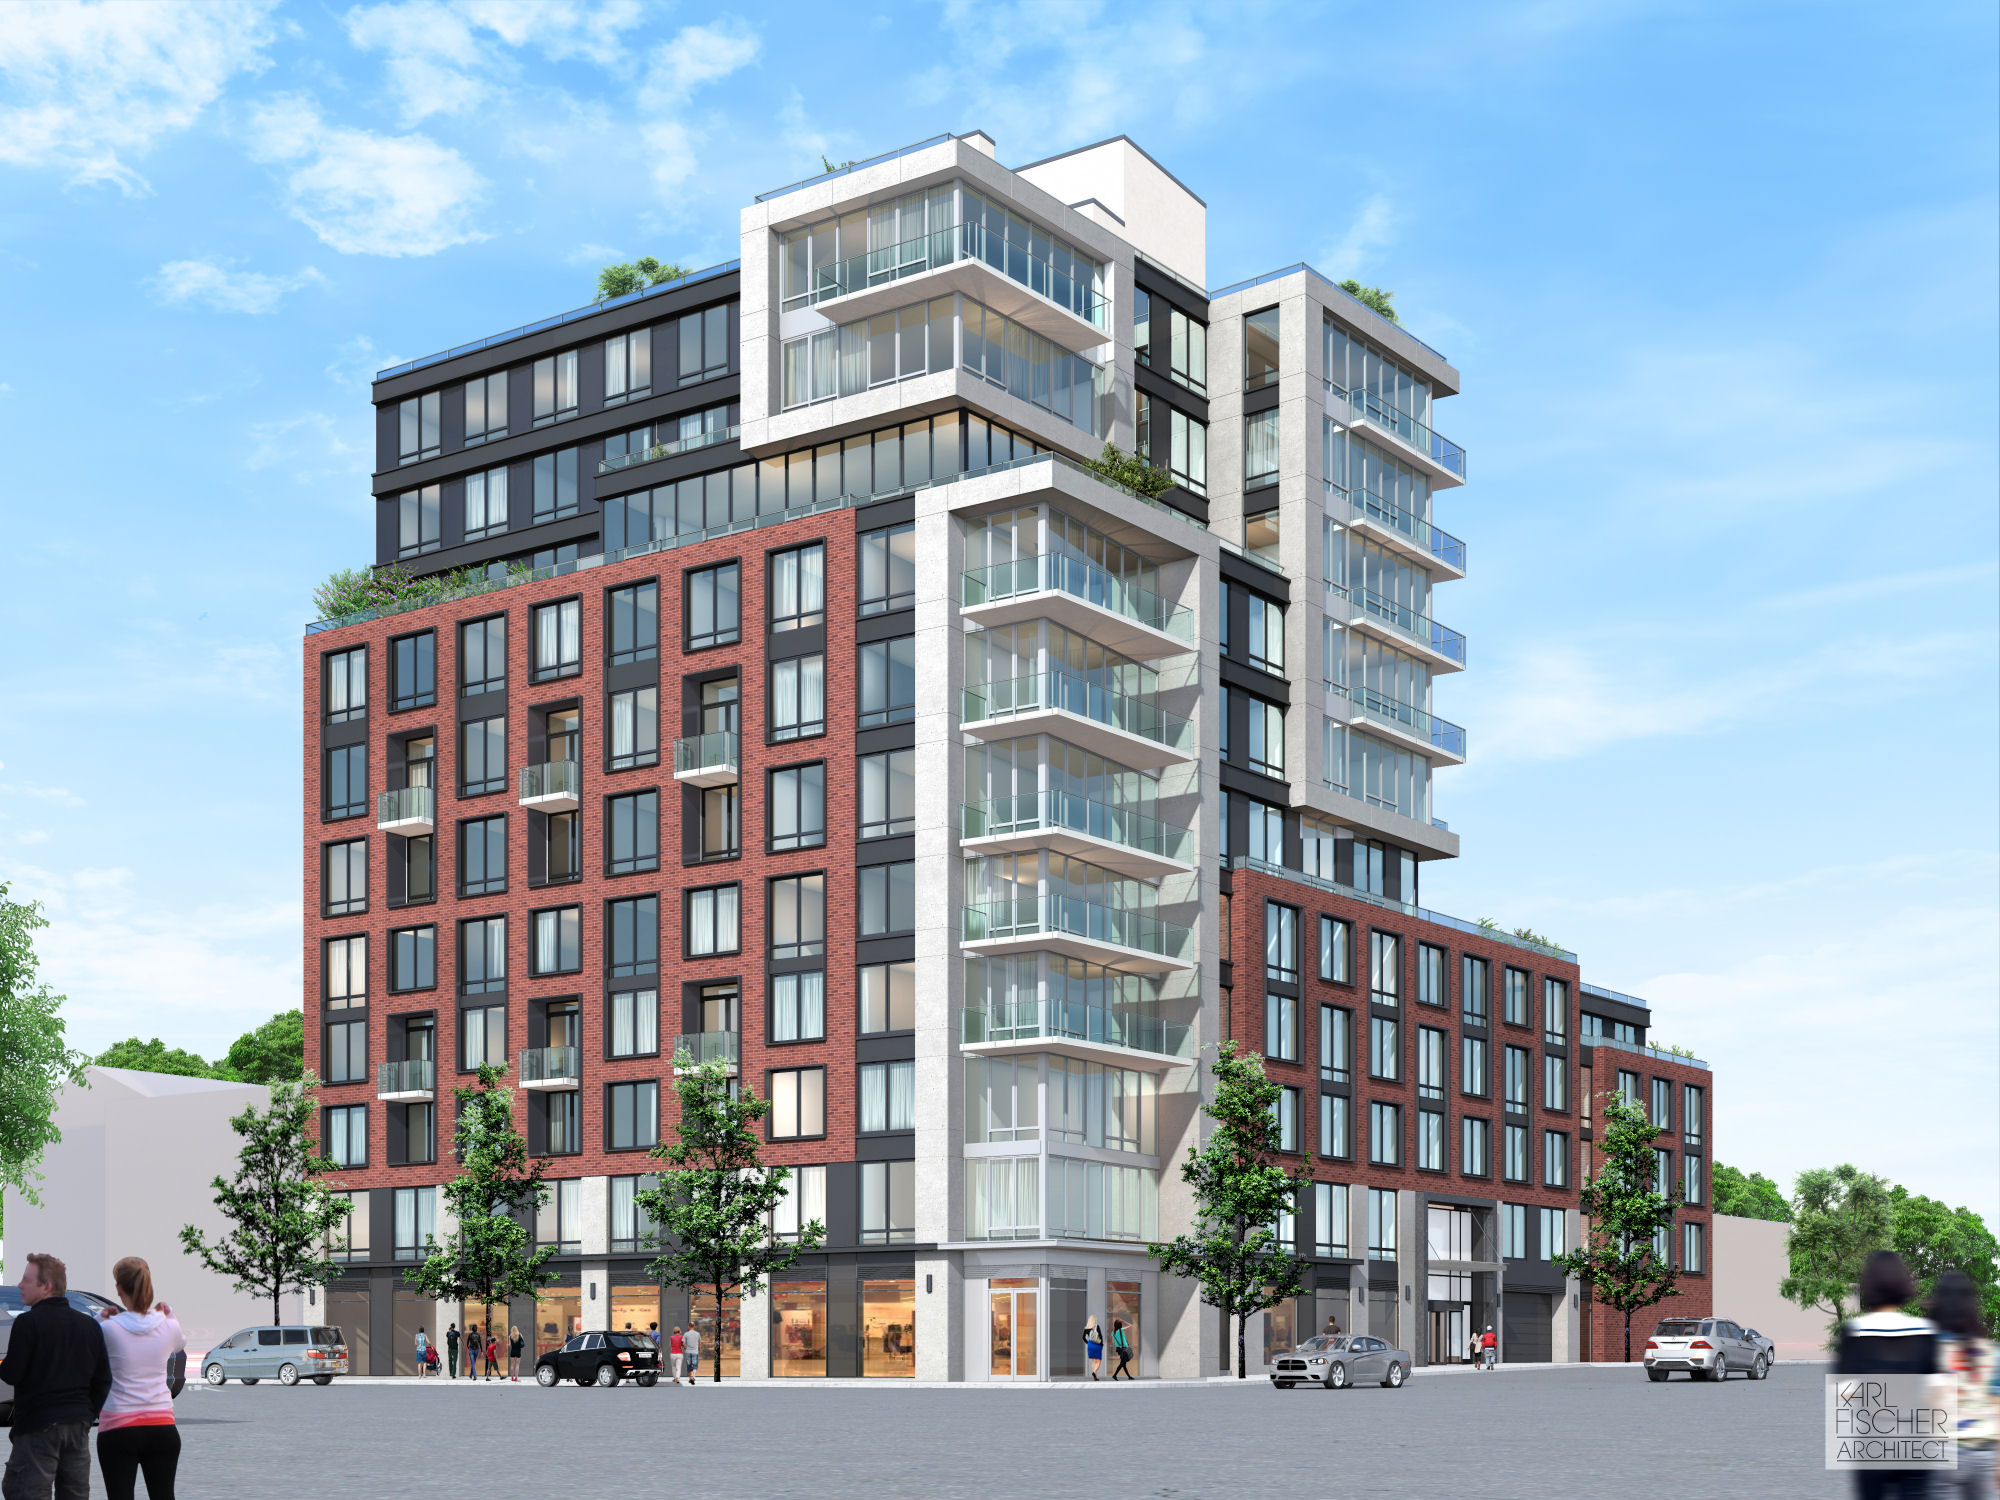 581 Fourth Avenue, rendering by Karl Fischer Architect